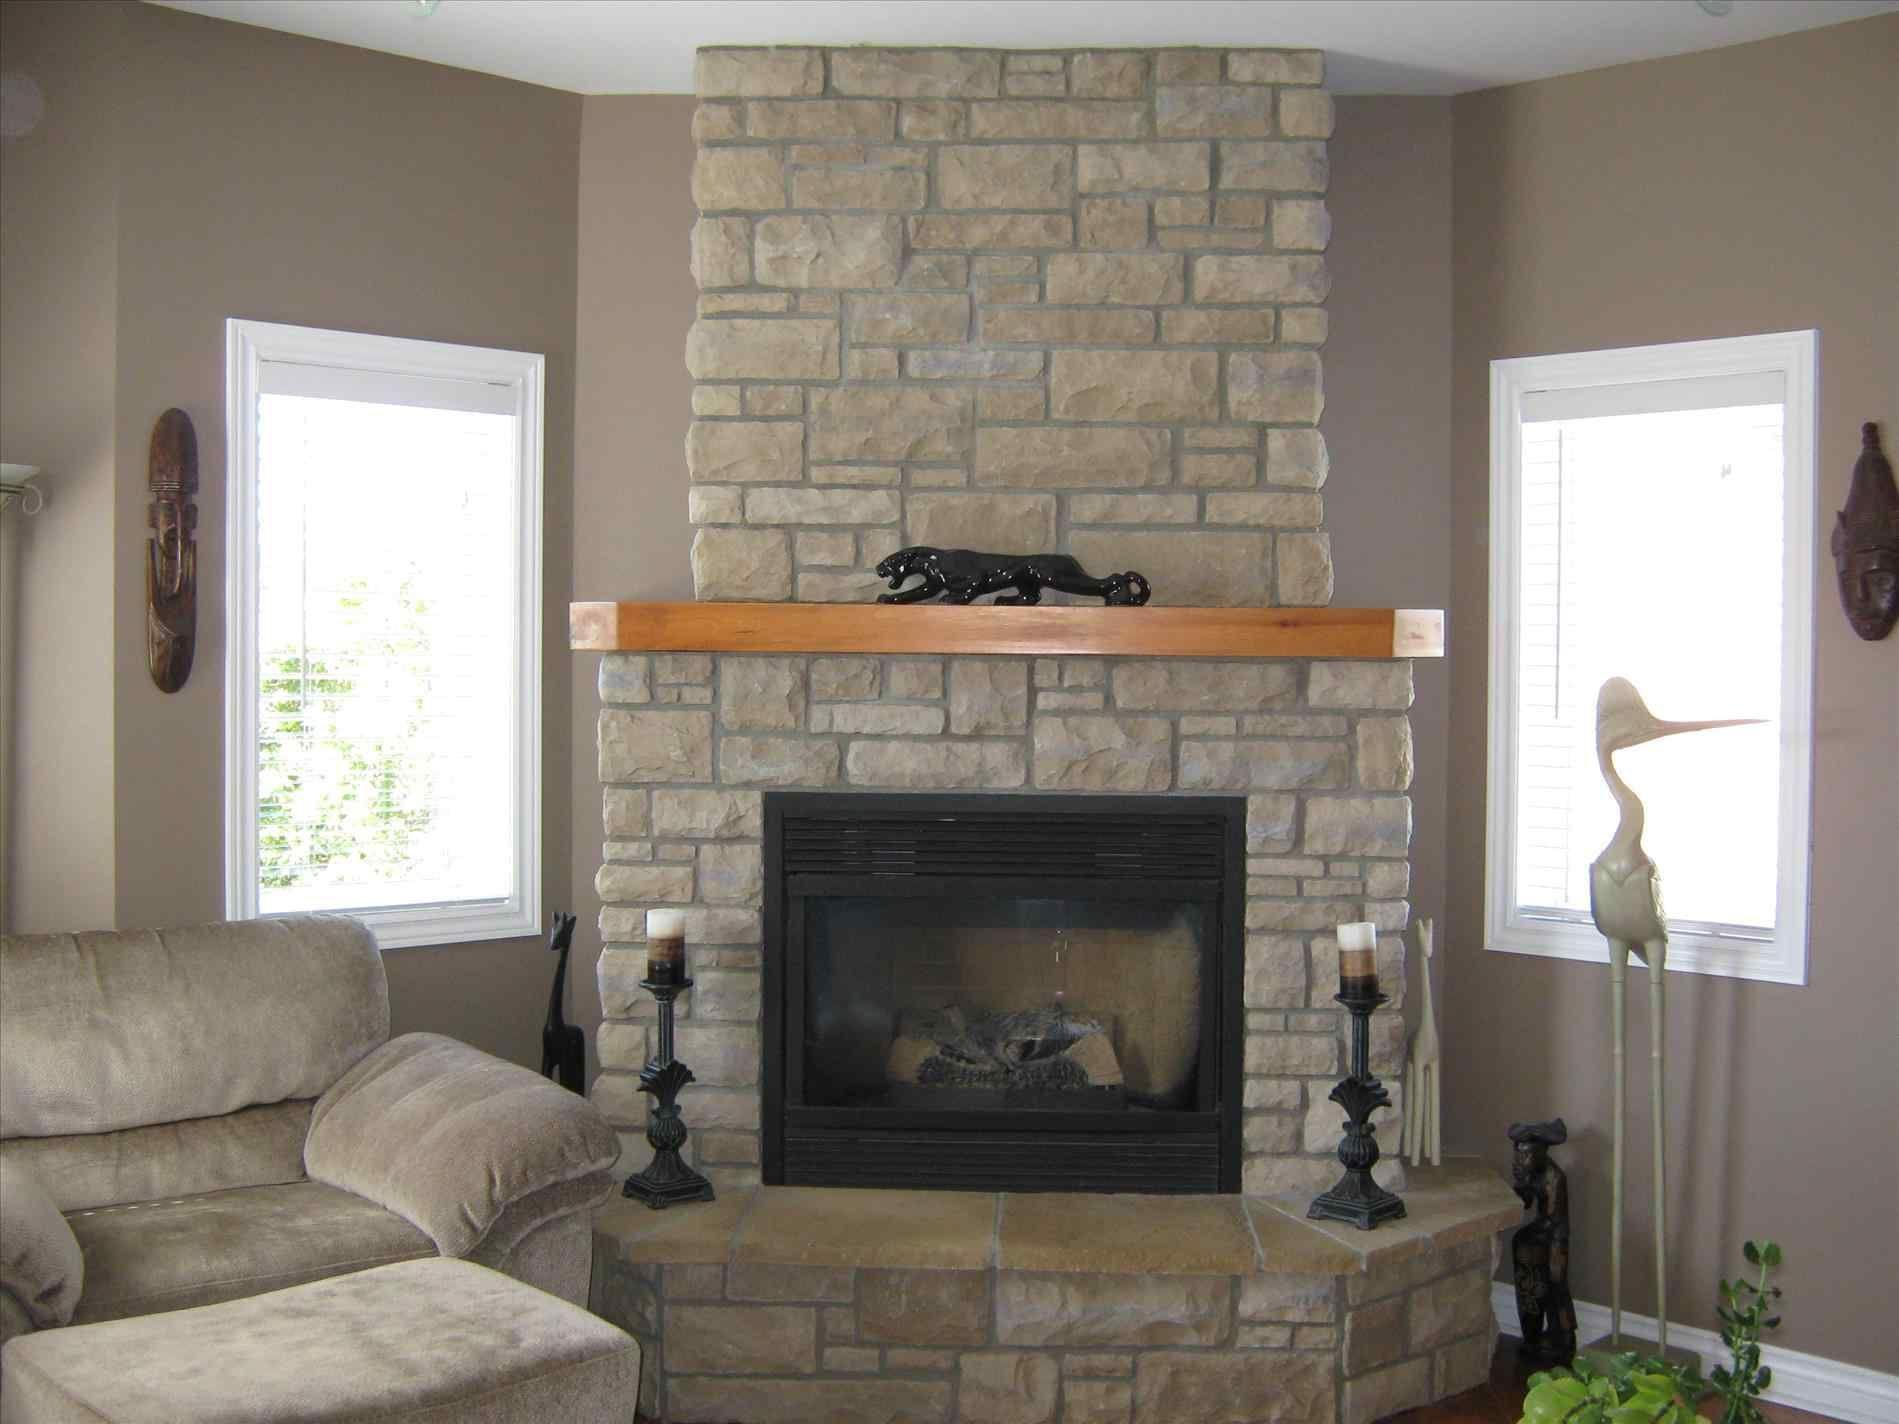 Image Result For Tile Fireplaces Design Ideas Fireplace Design